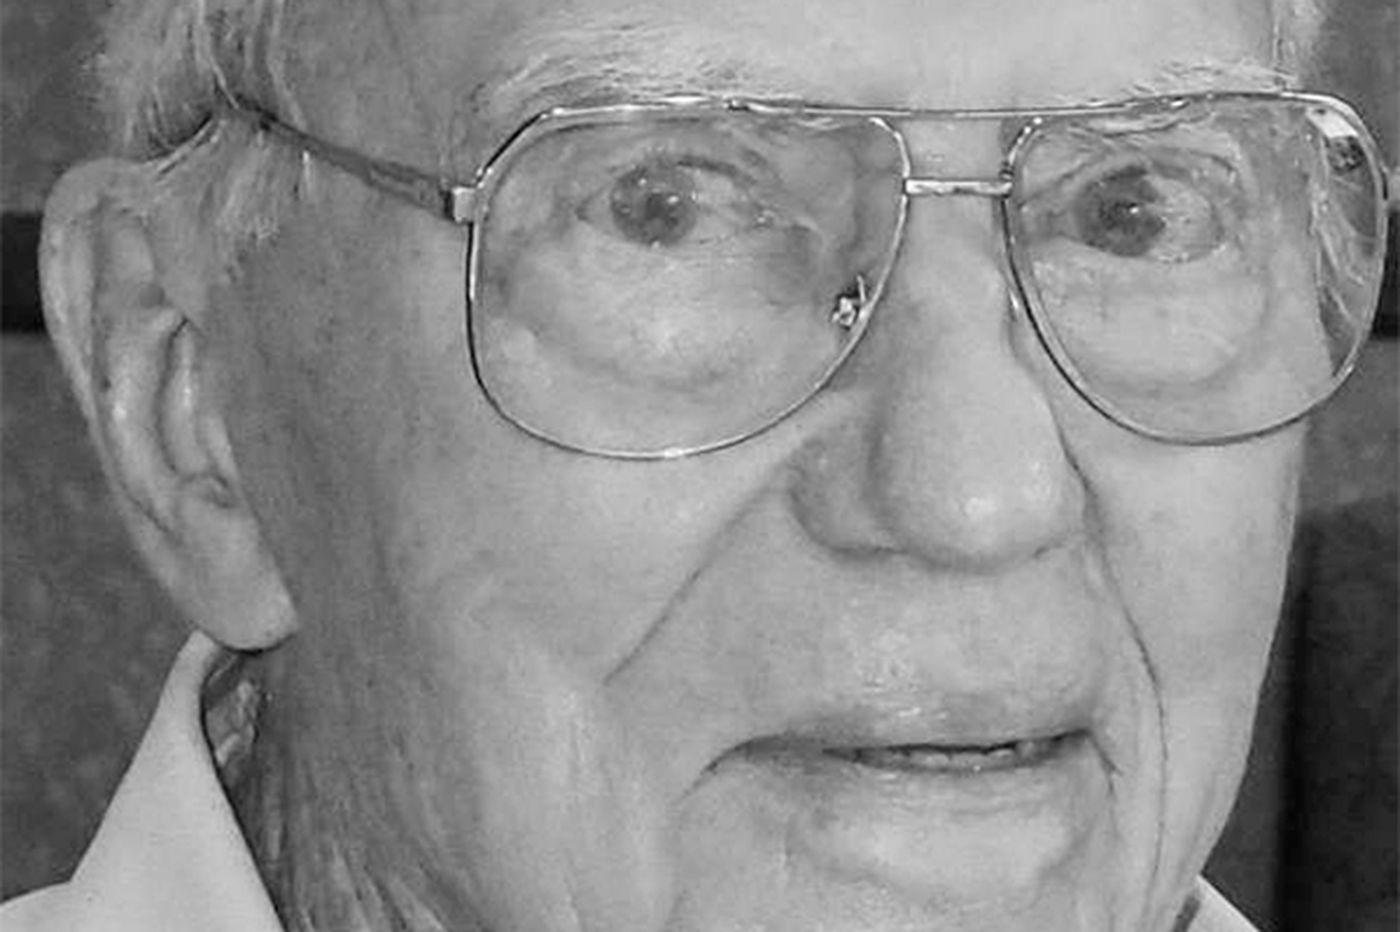 Robert Hesse Jr., 91, printing-company executive